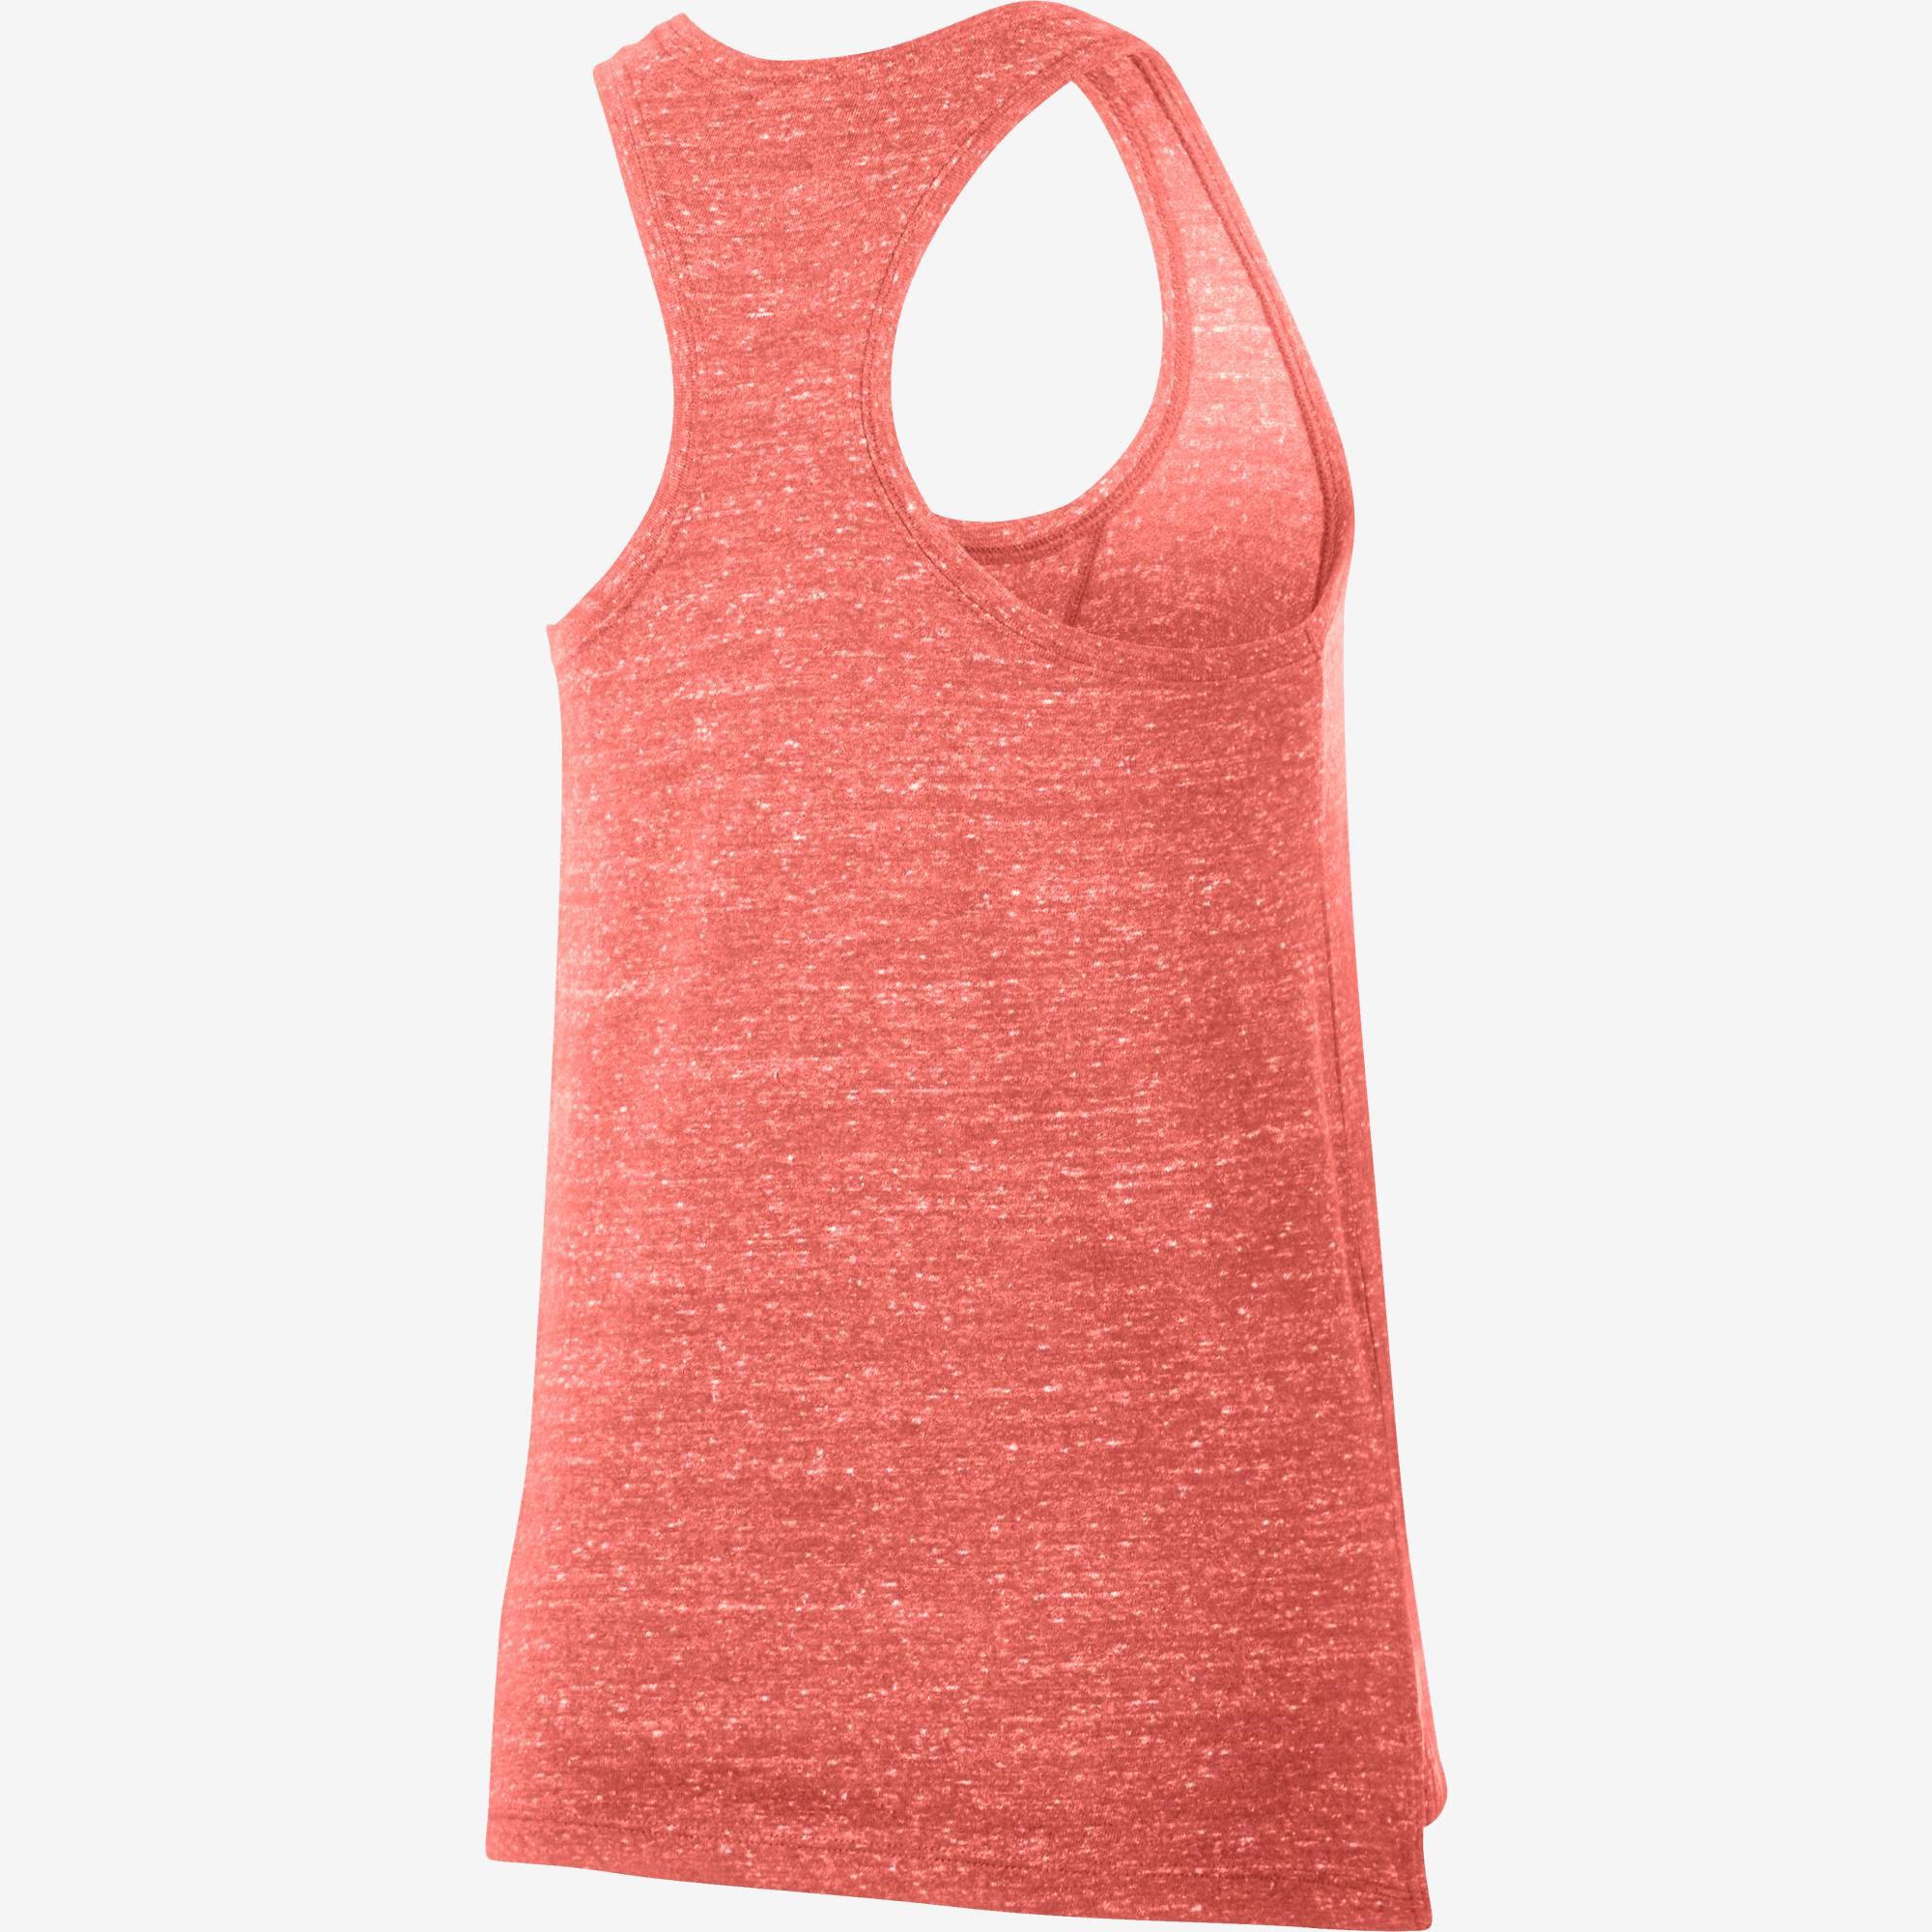 Regata Nike Sportswear Gym Vintage Feminina